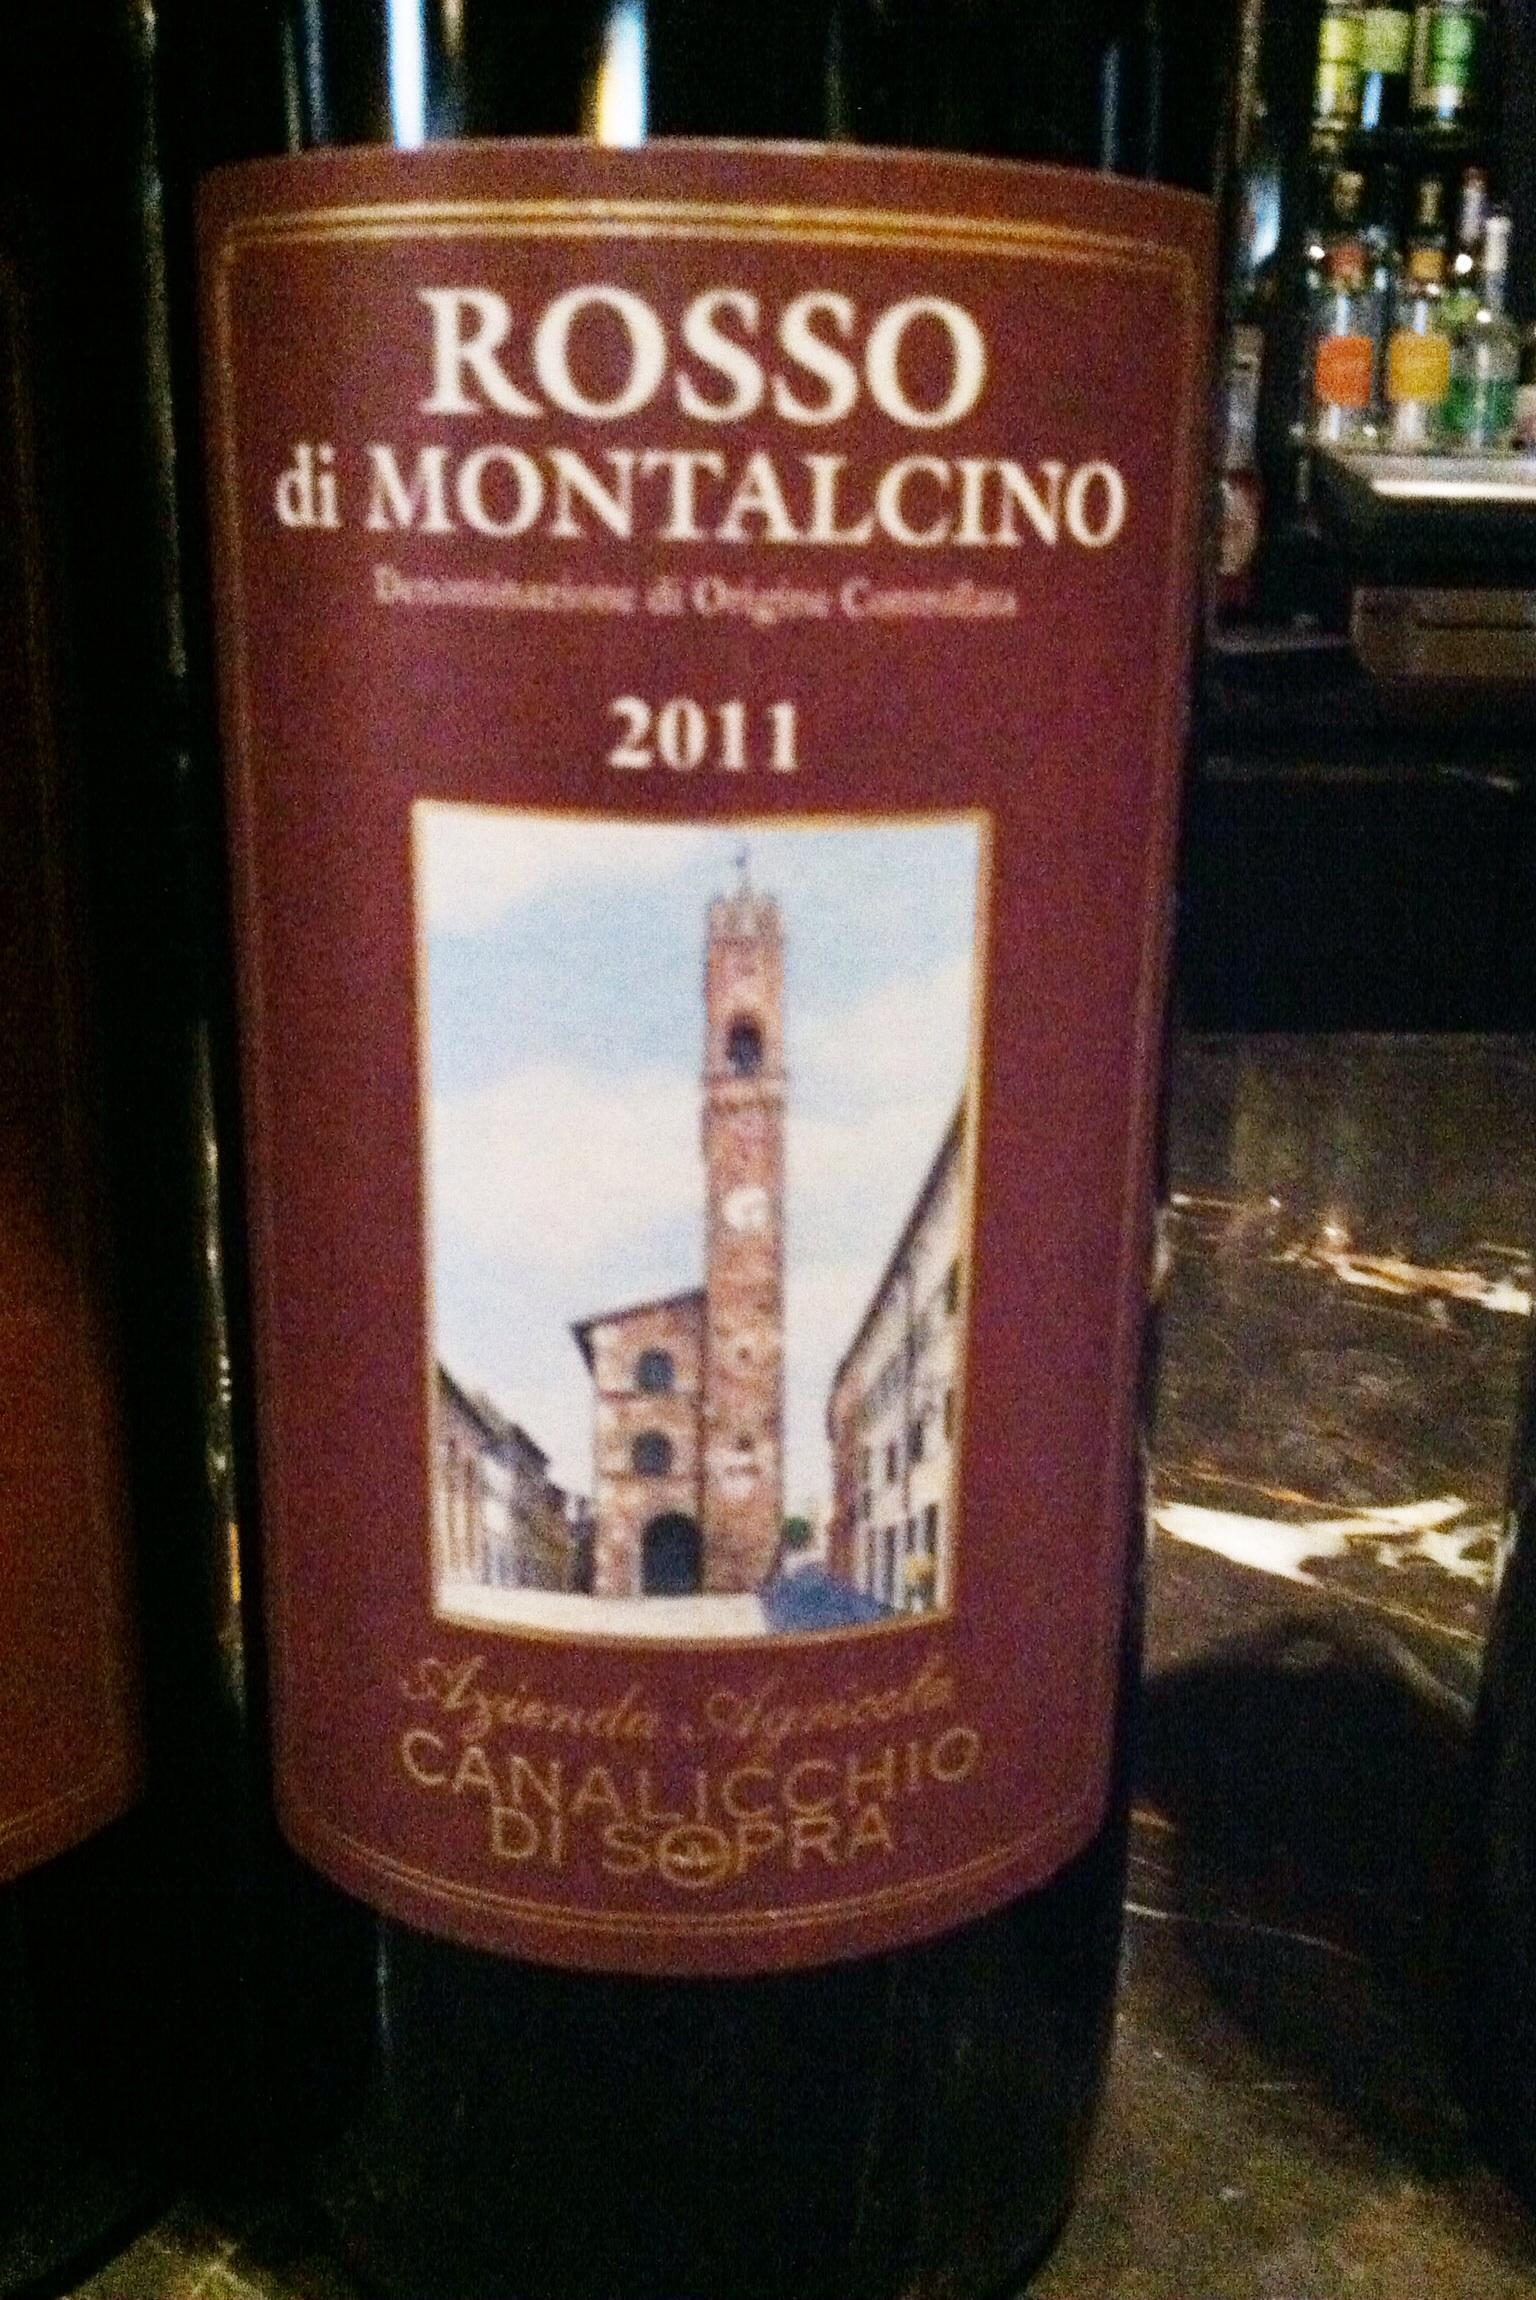 Rosso di Montalcimo, photo by Shana Sokol of Shana Speaks Wine